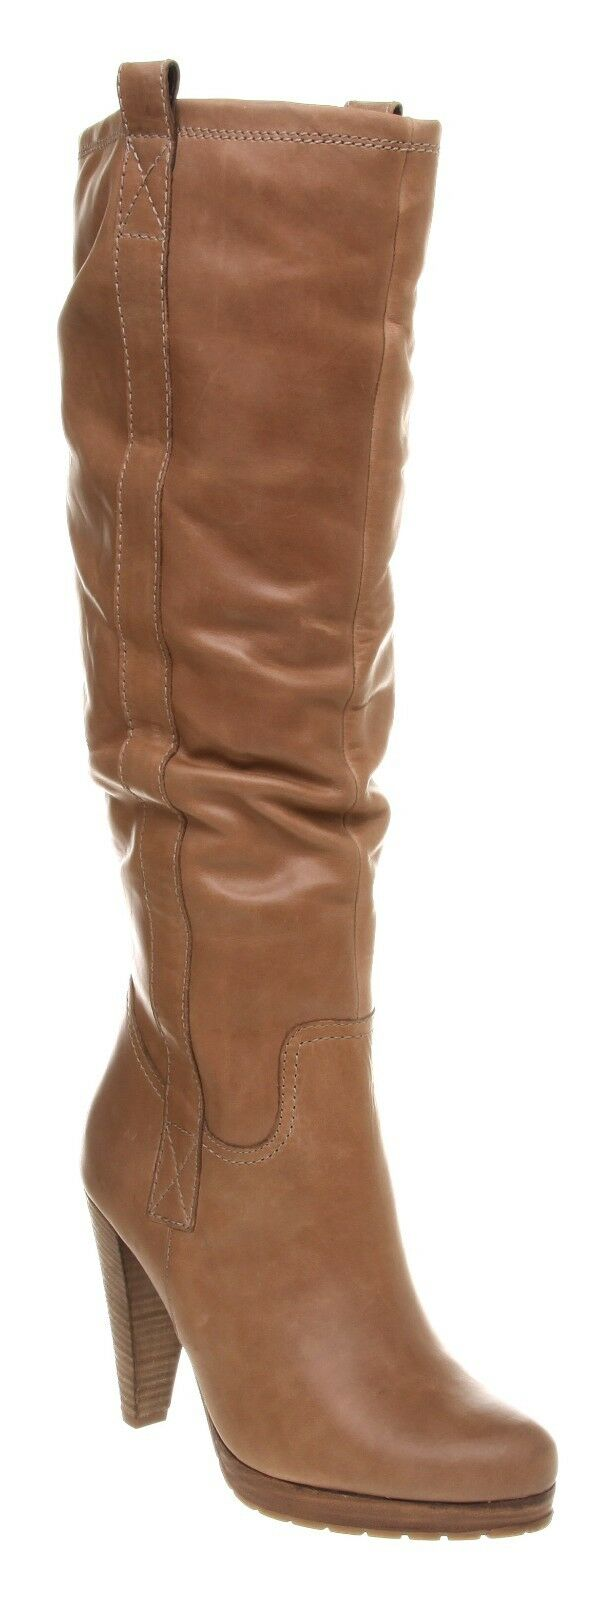 Office Conform Platform Knee Bt Natural Leather Boots Reg-Price $259.99